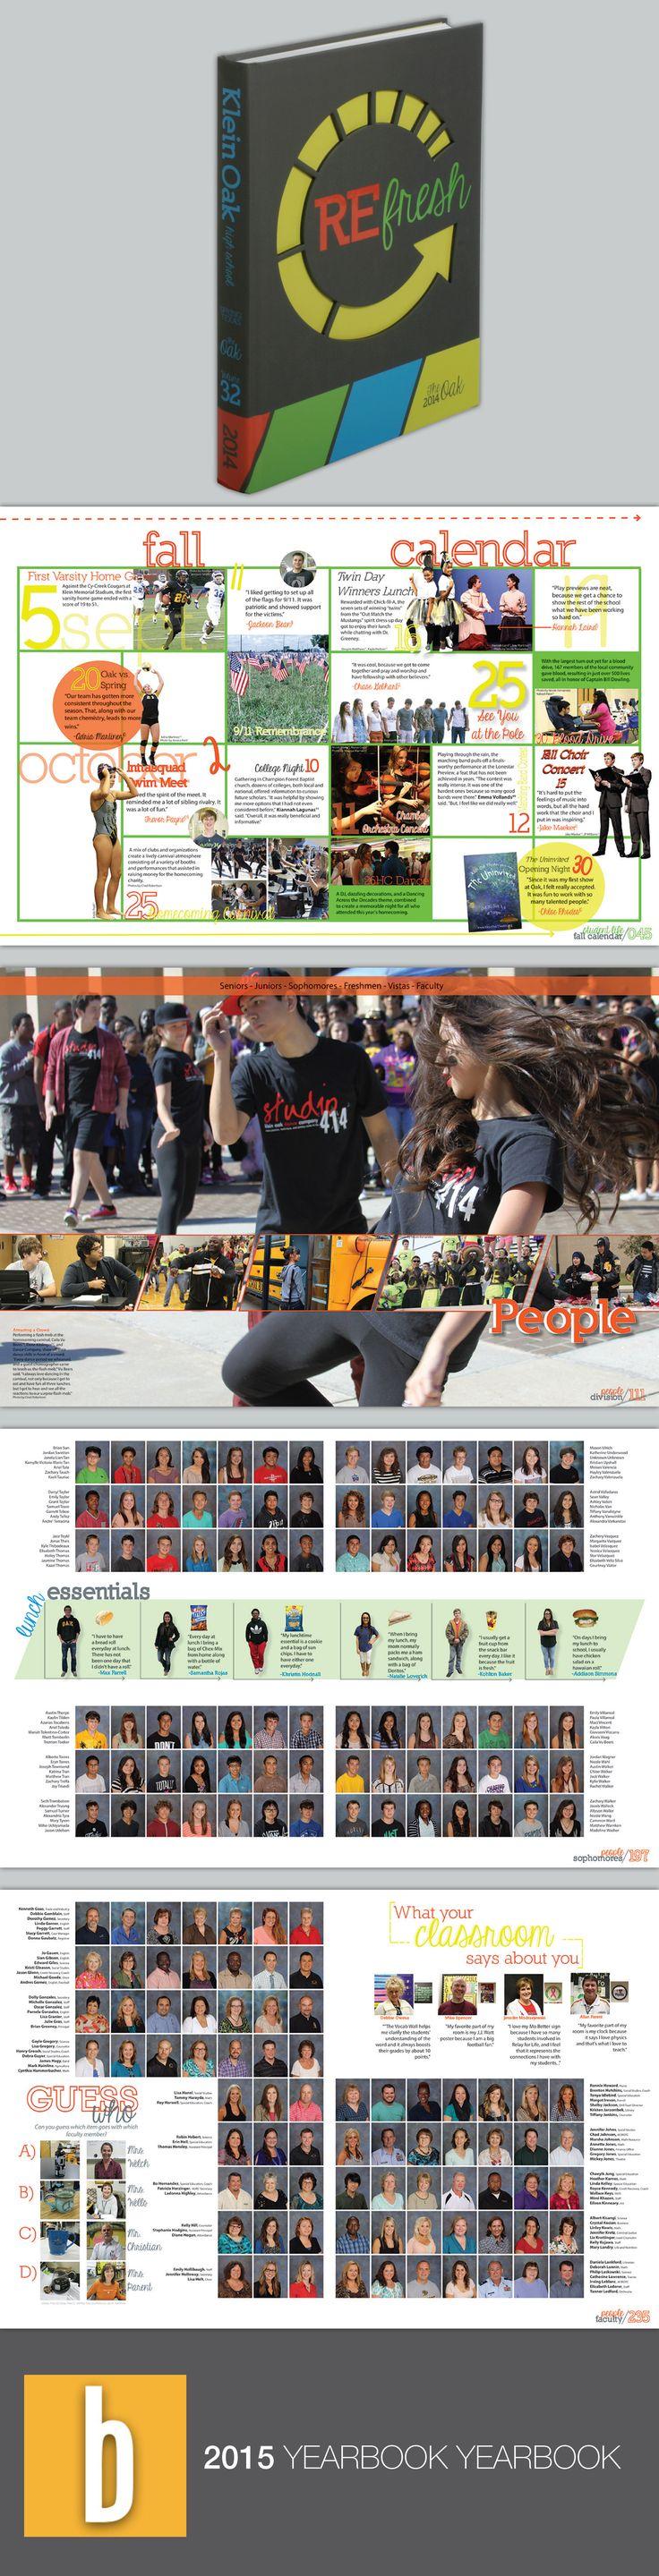 best yearbook images on pinterest teaching yearbook yearbook